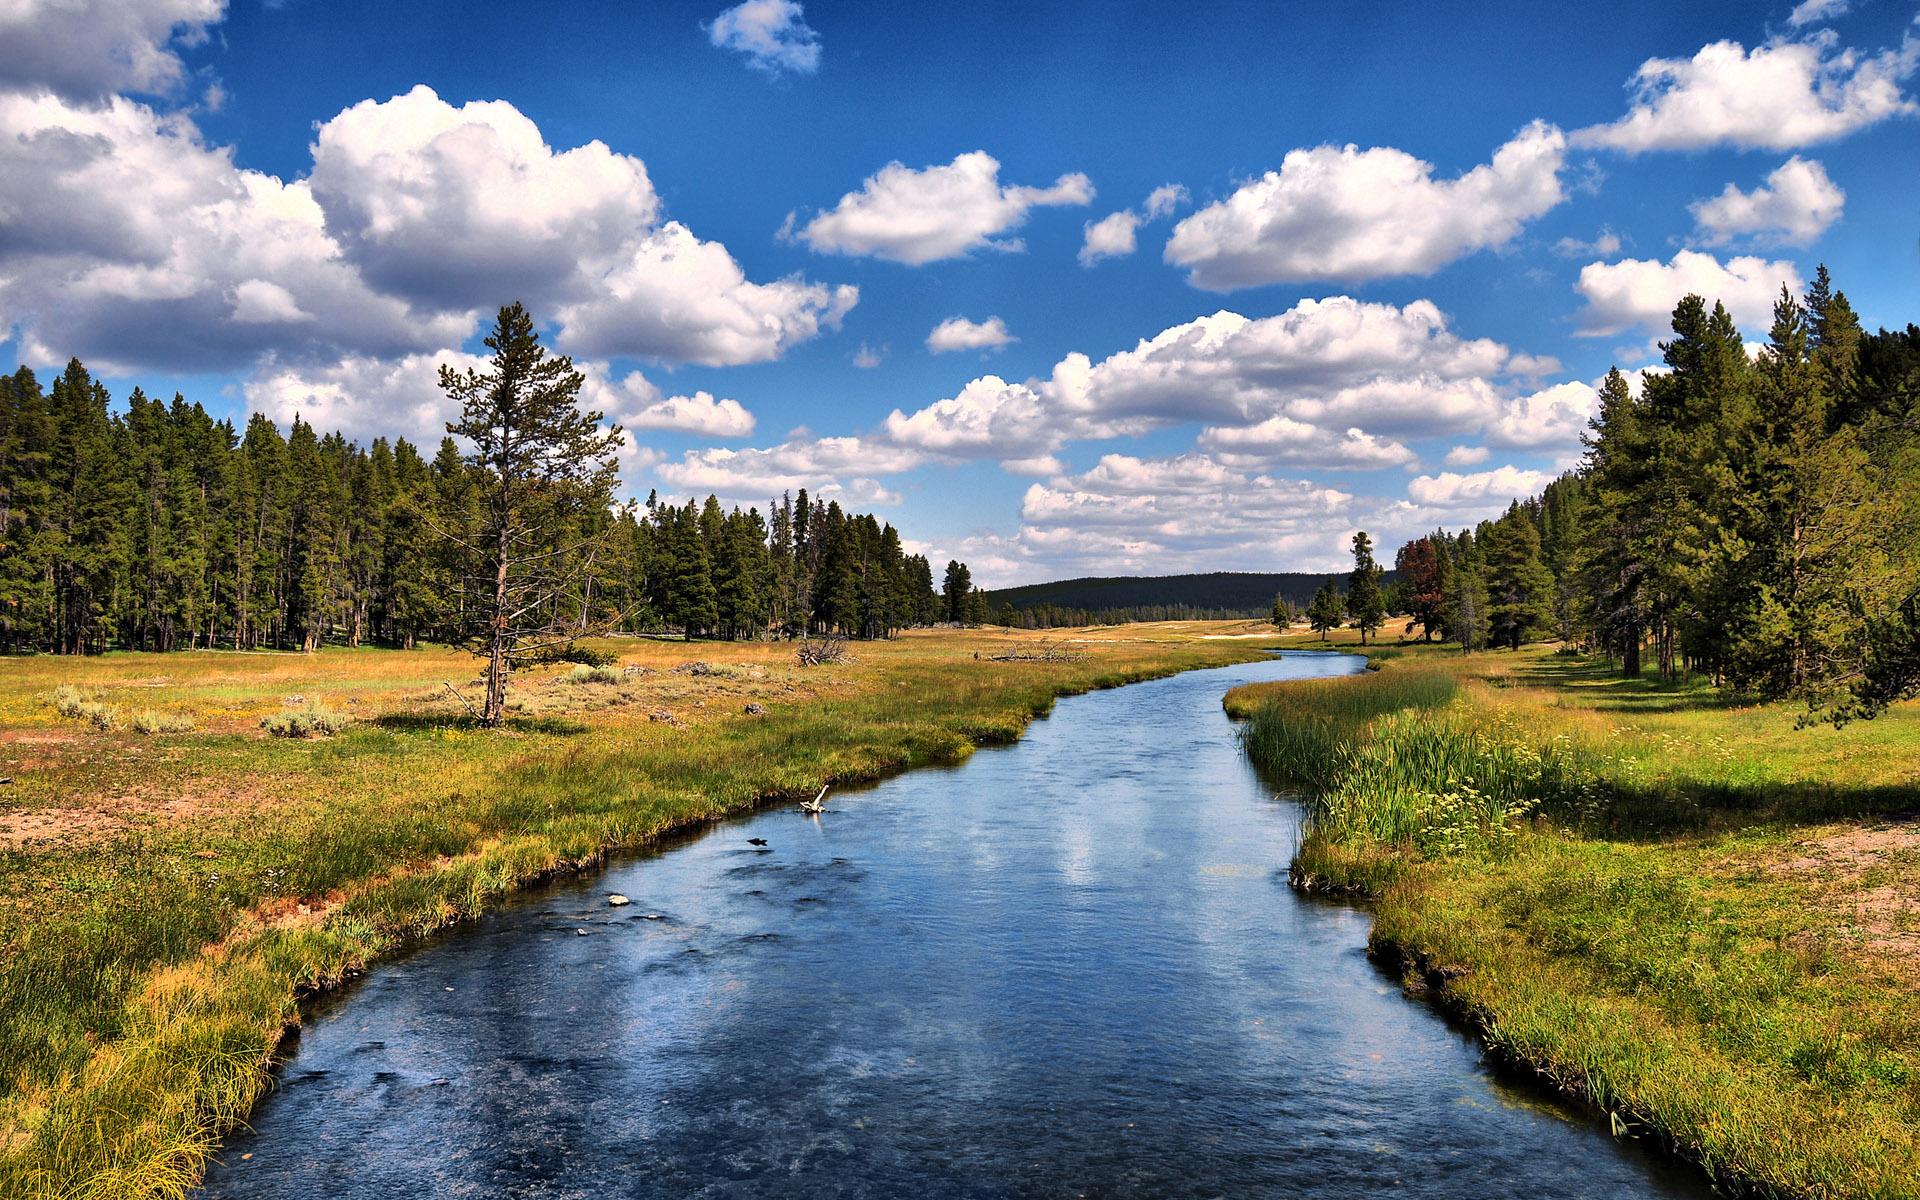 river wallpaper forest